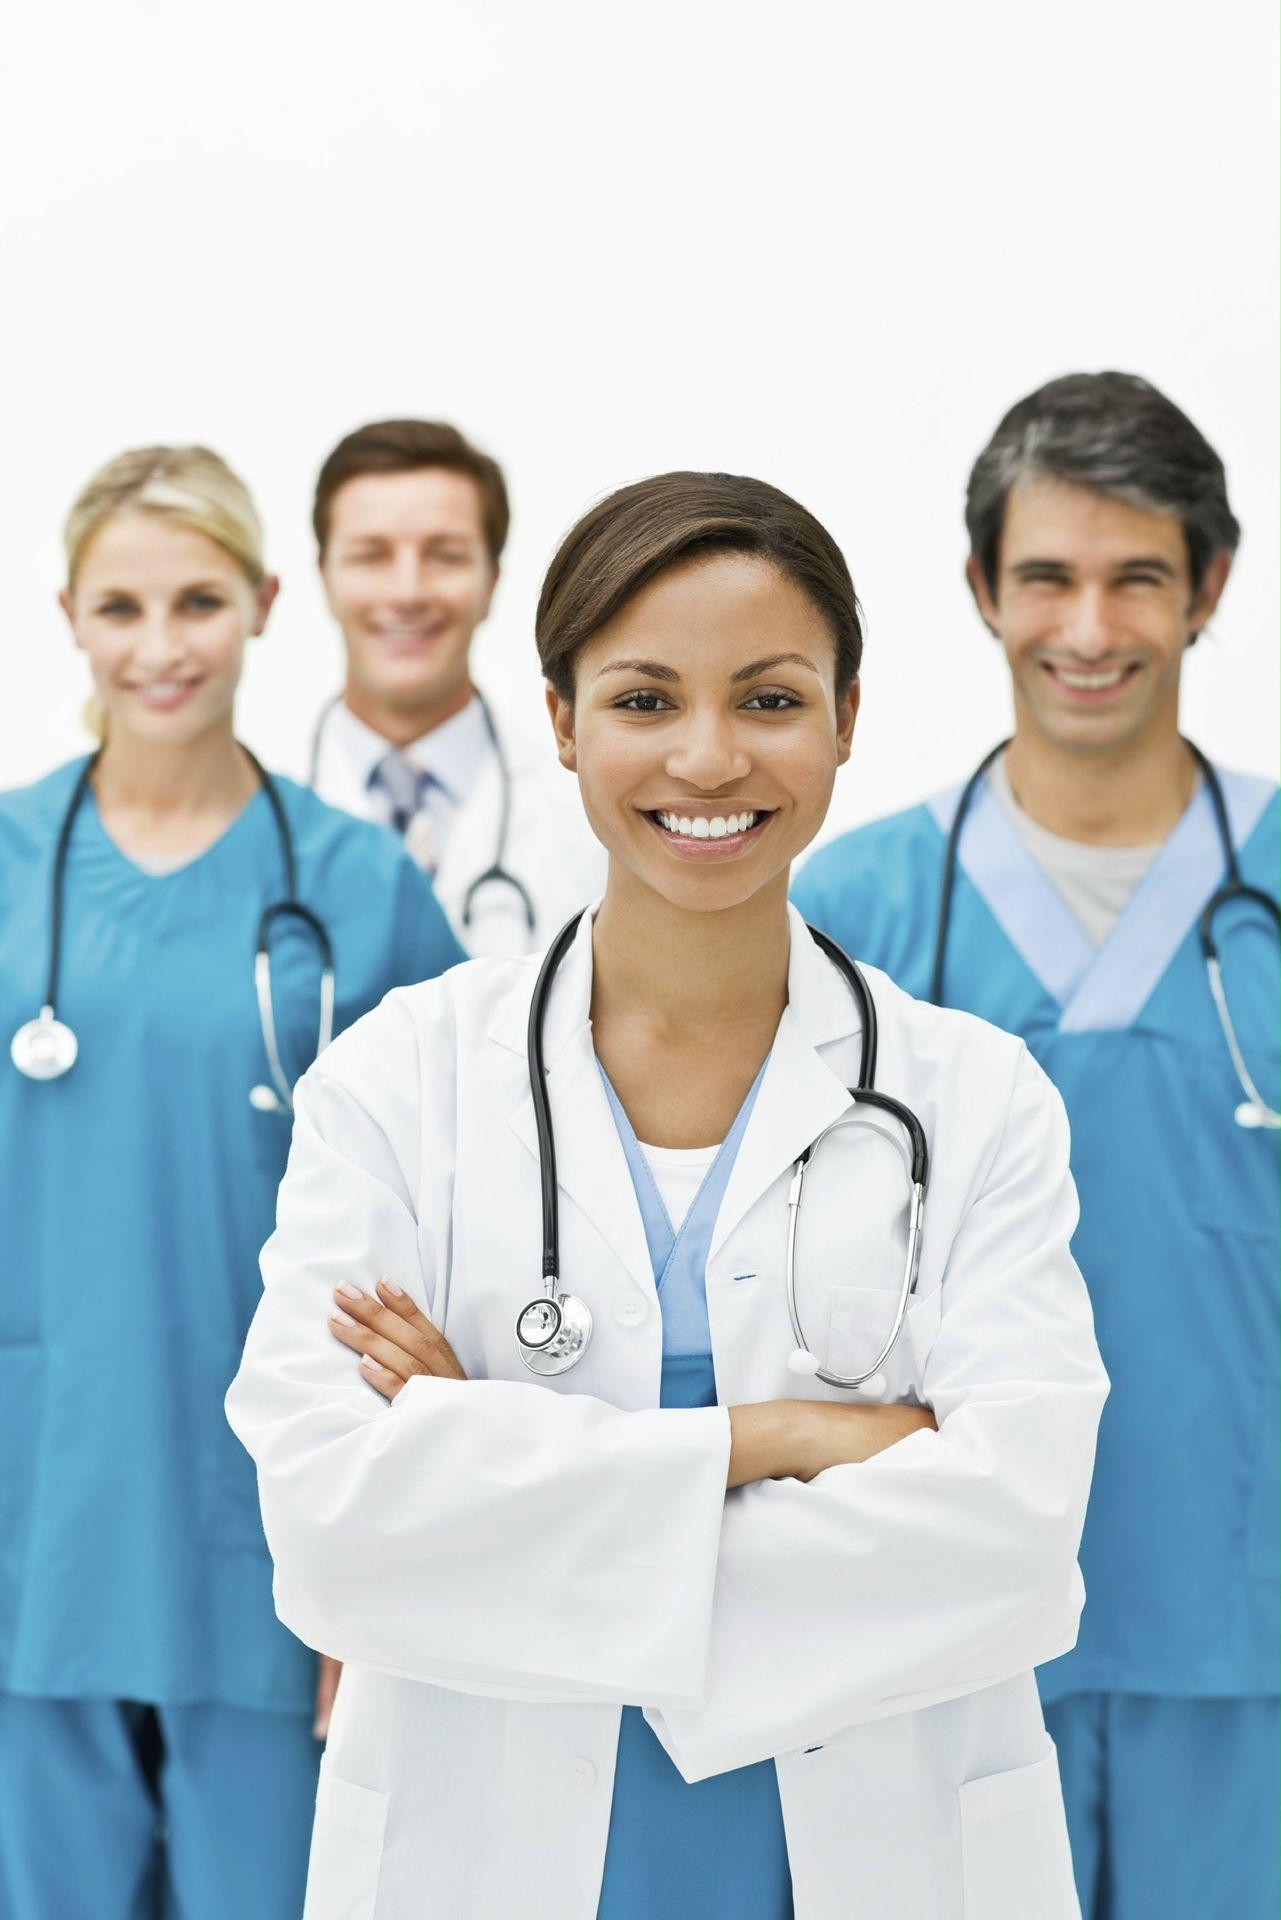 istock_000008064618large-health